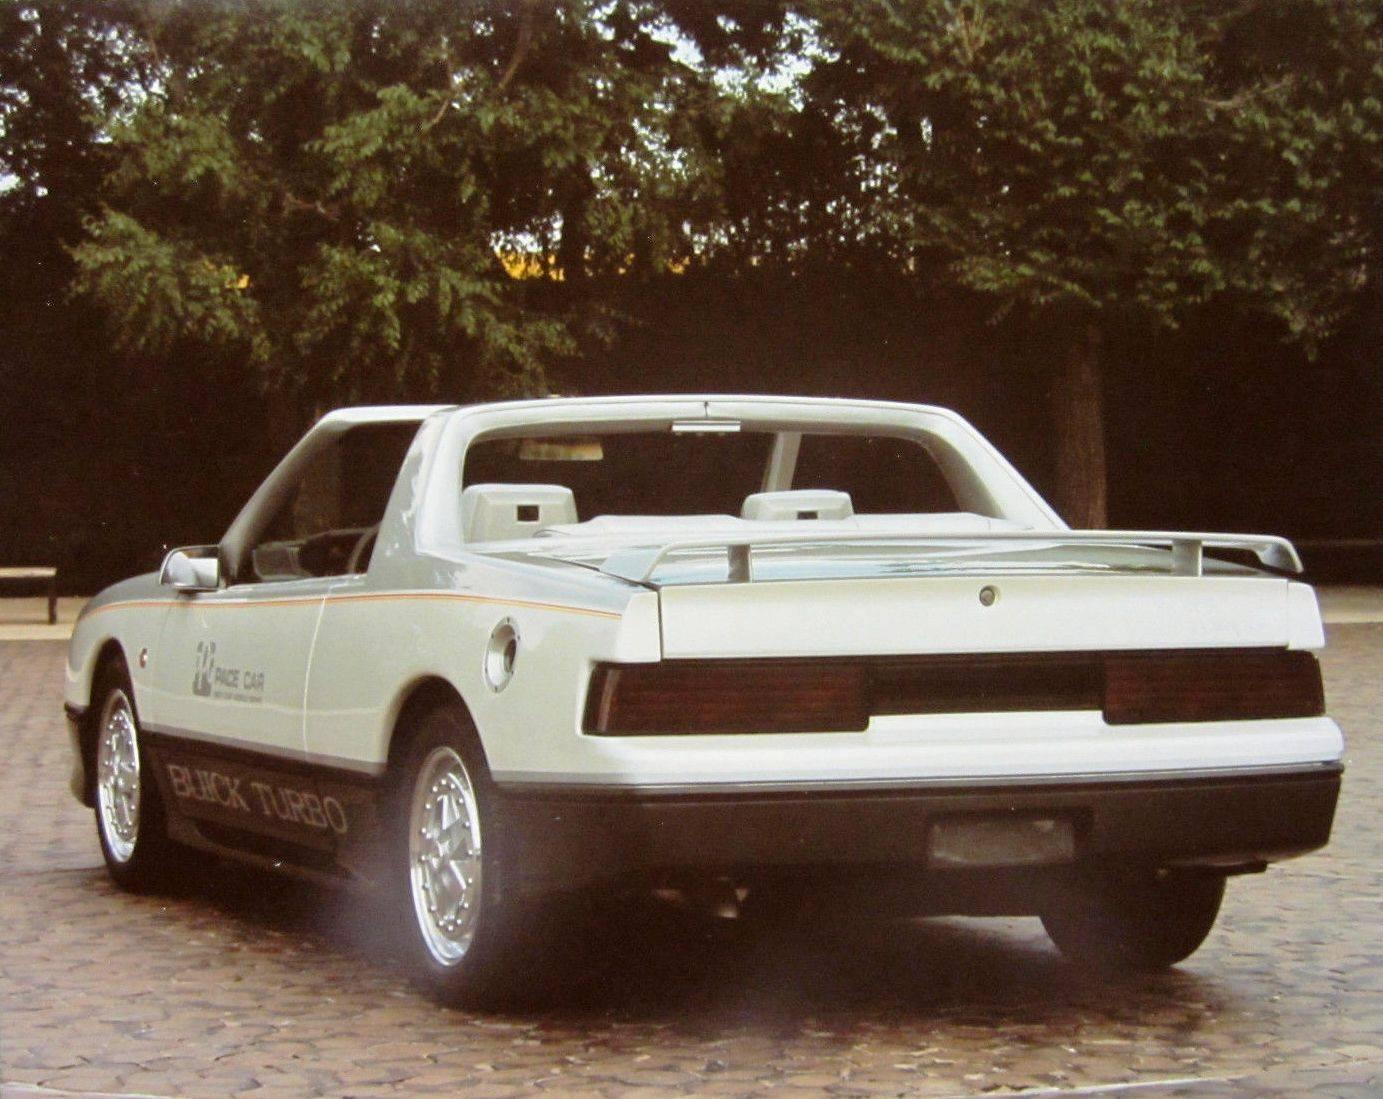 Buick Skyhawk Turbo Ppg Pace Car Rear